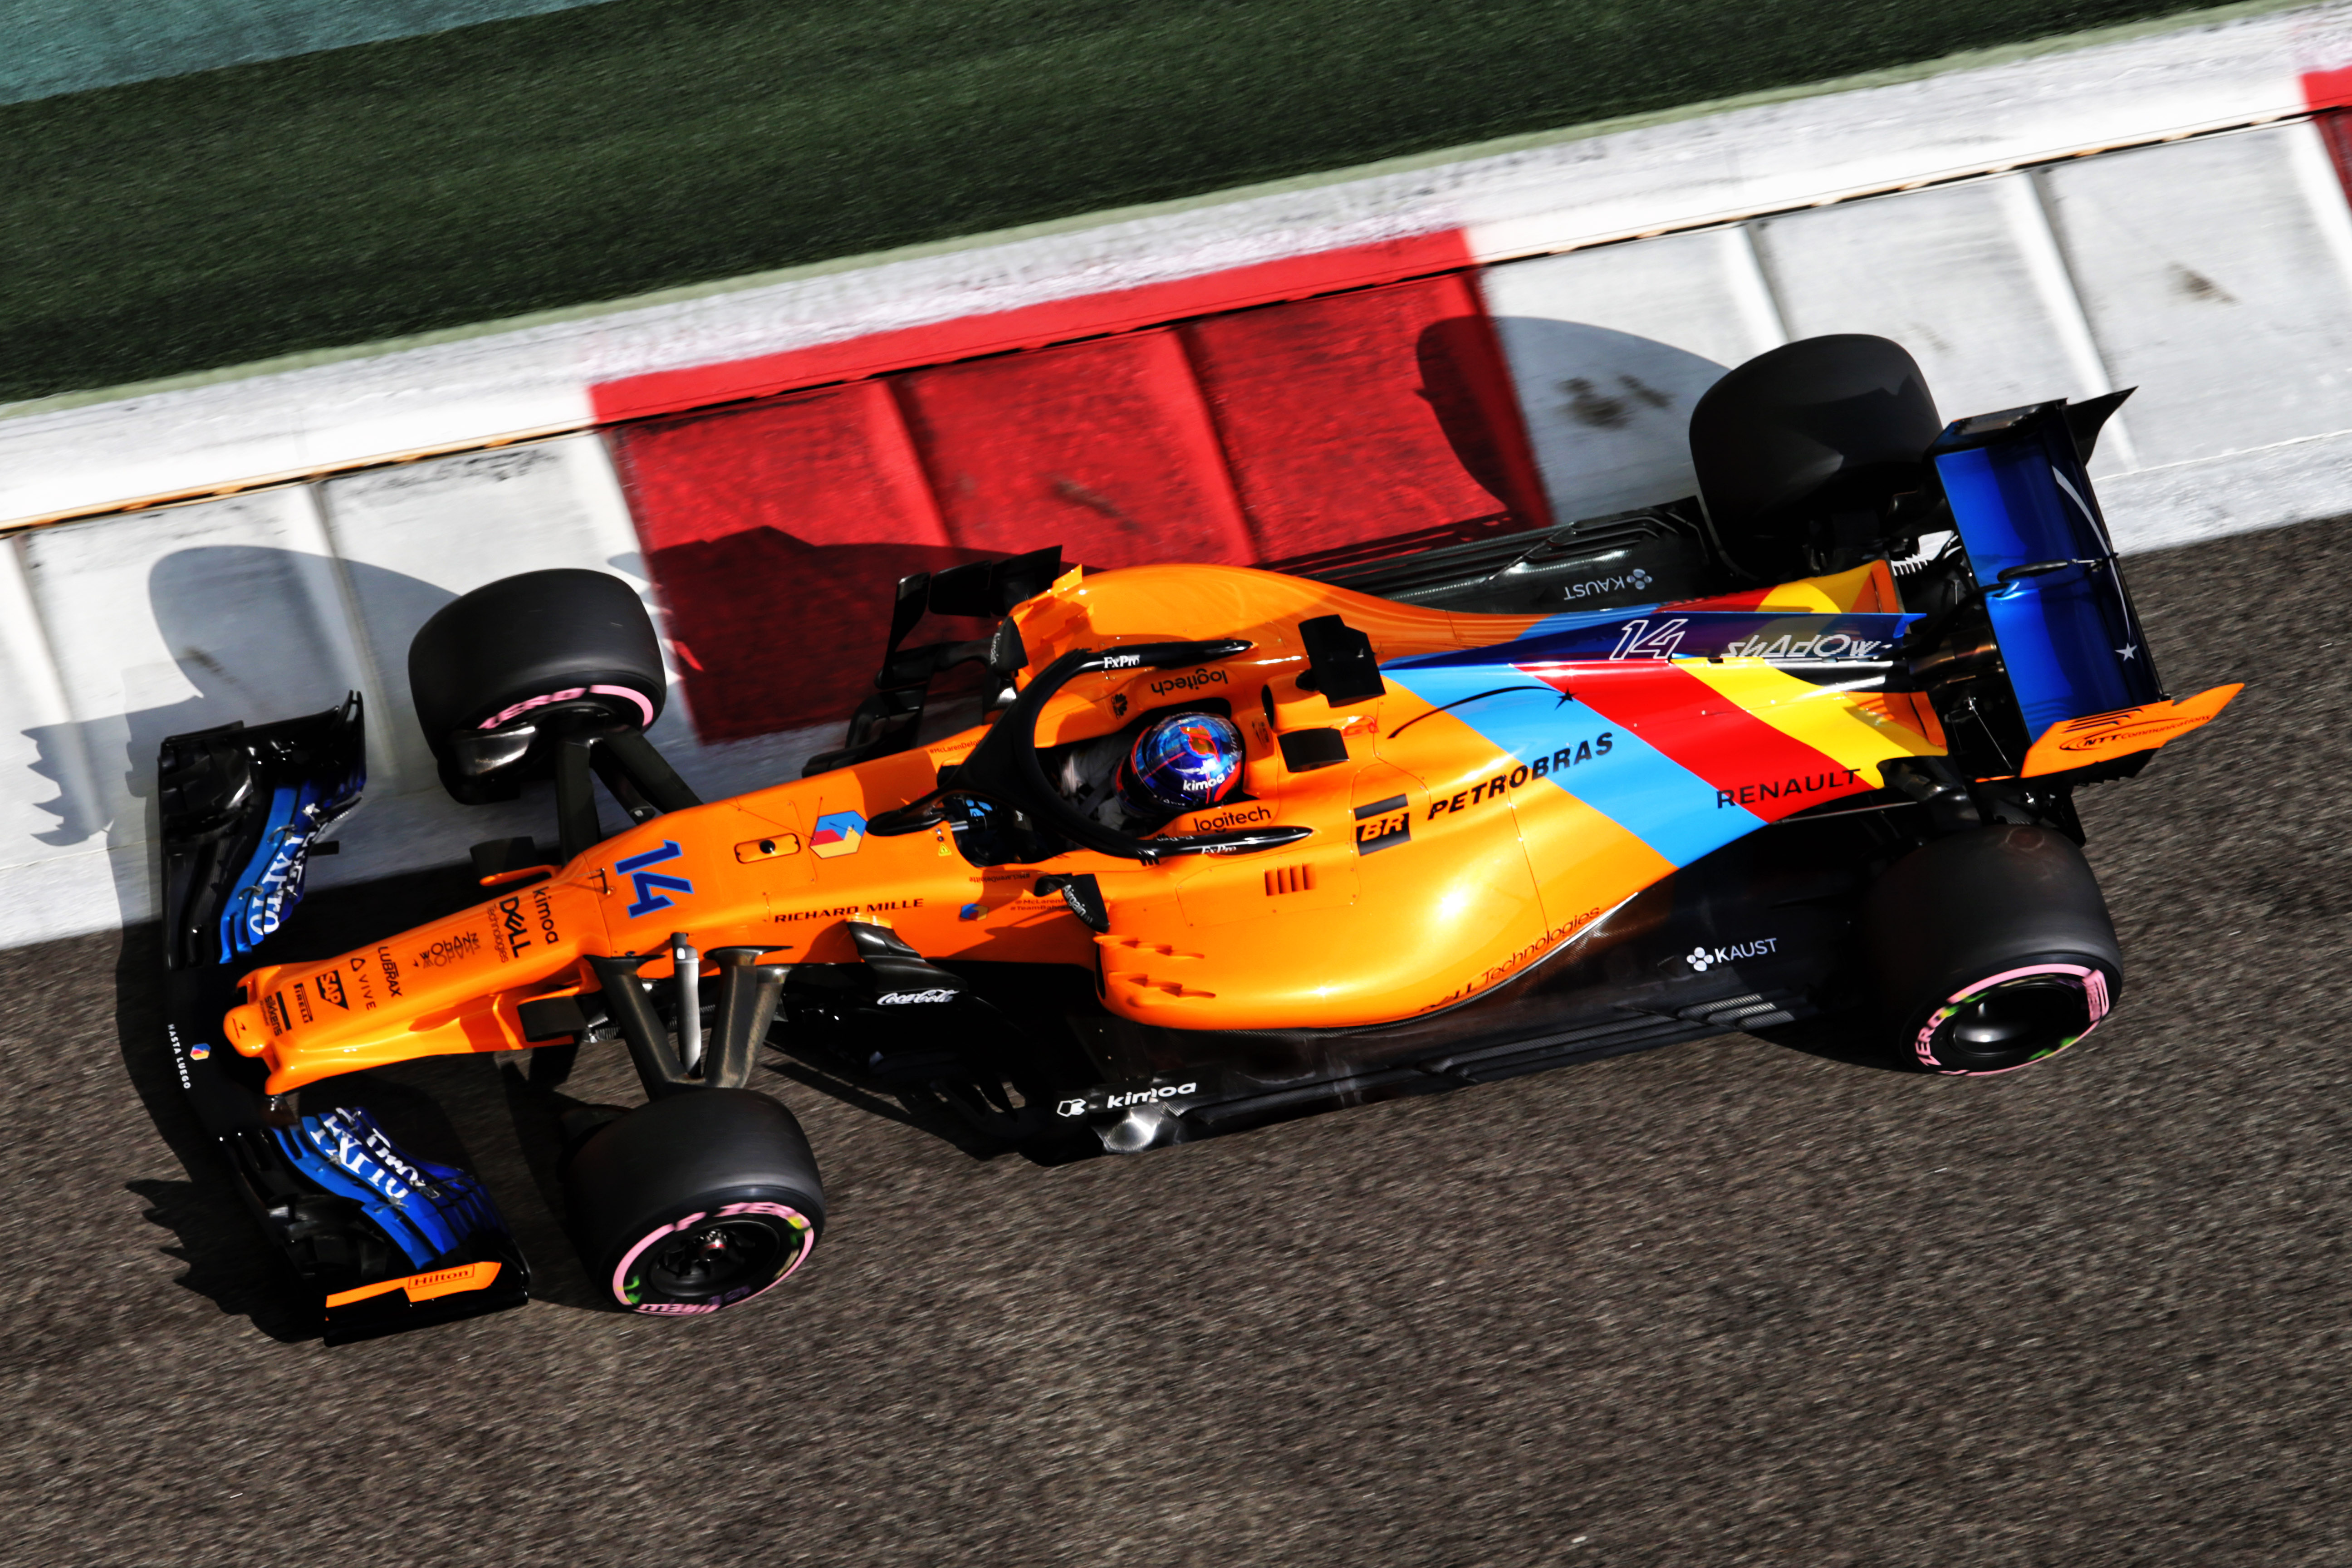 Fernando Alonso - McLaren Renault [2018]